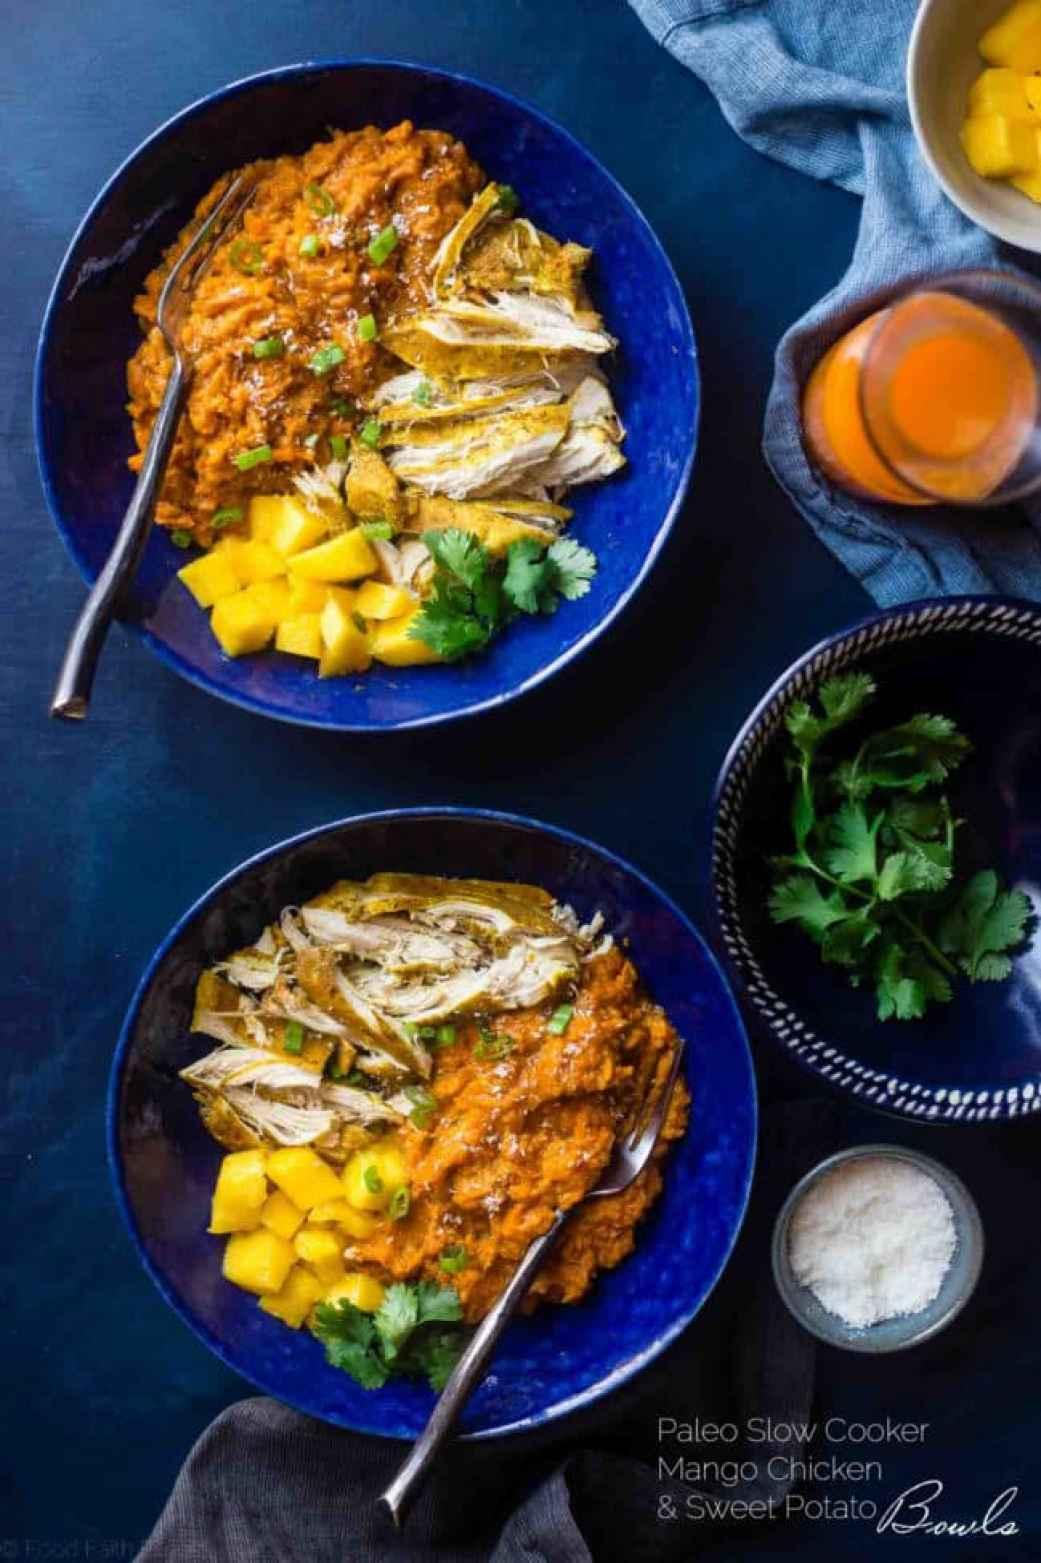 10 Must-Make Crockpot Recipes For Chicken